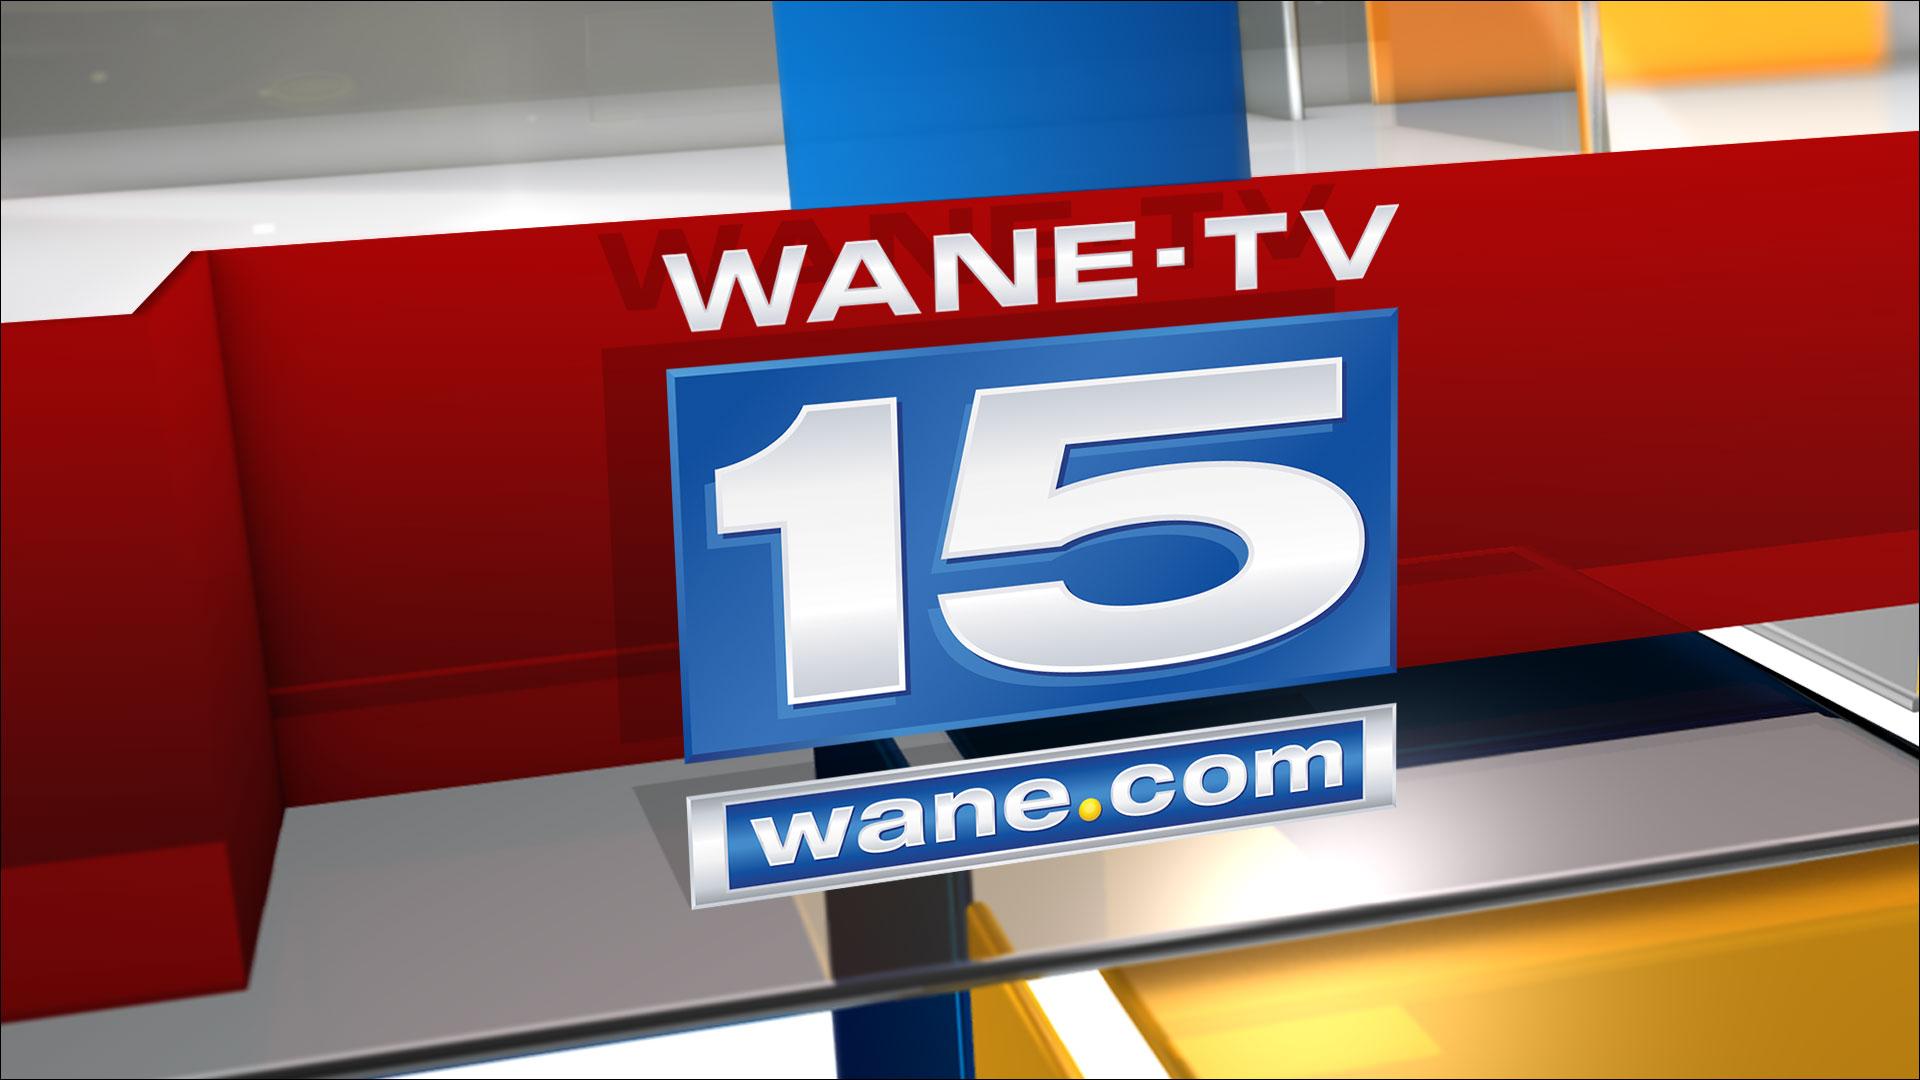 WANE-TV and WANE.com generic